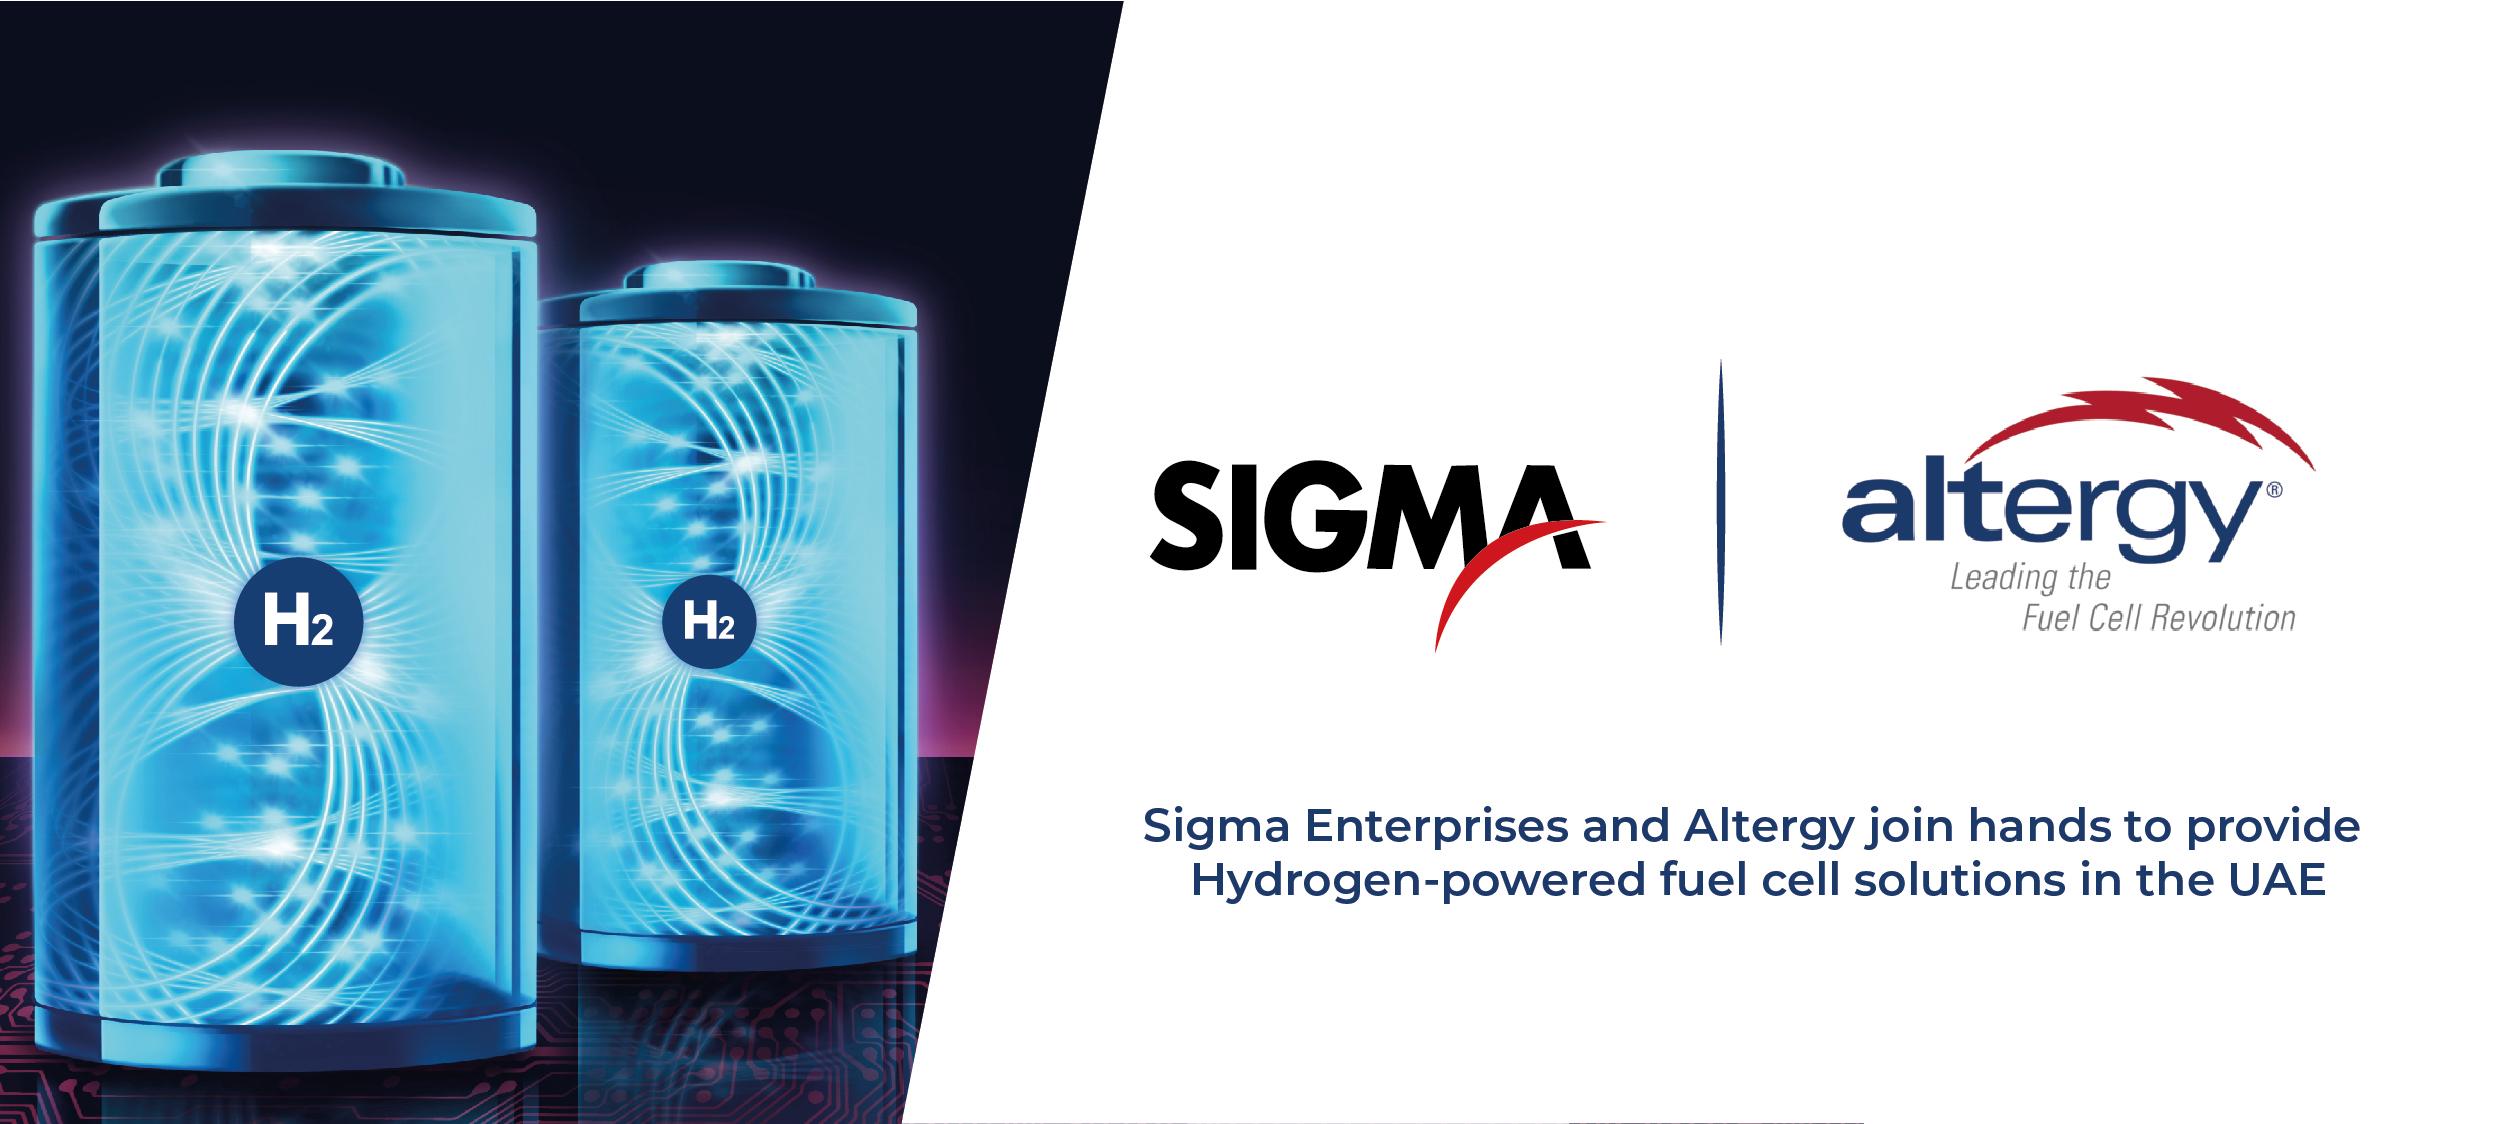 Altregy and Sigma Enterprises partnership Announcement